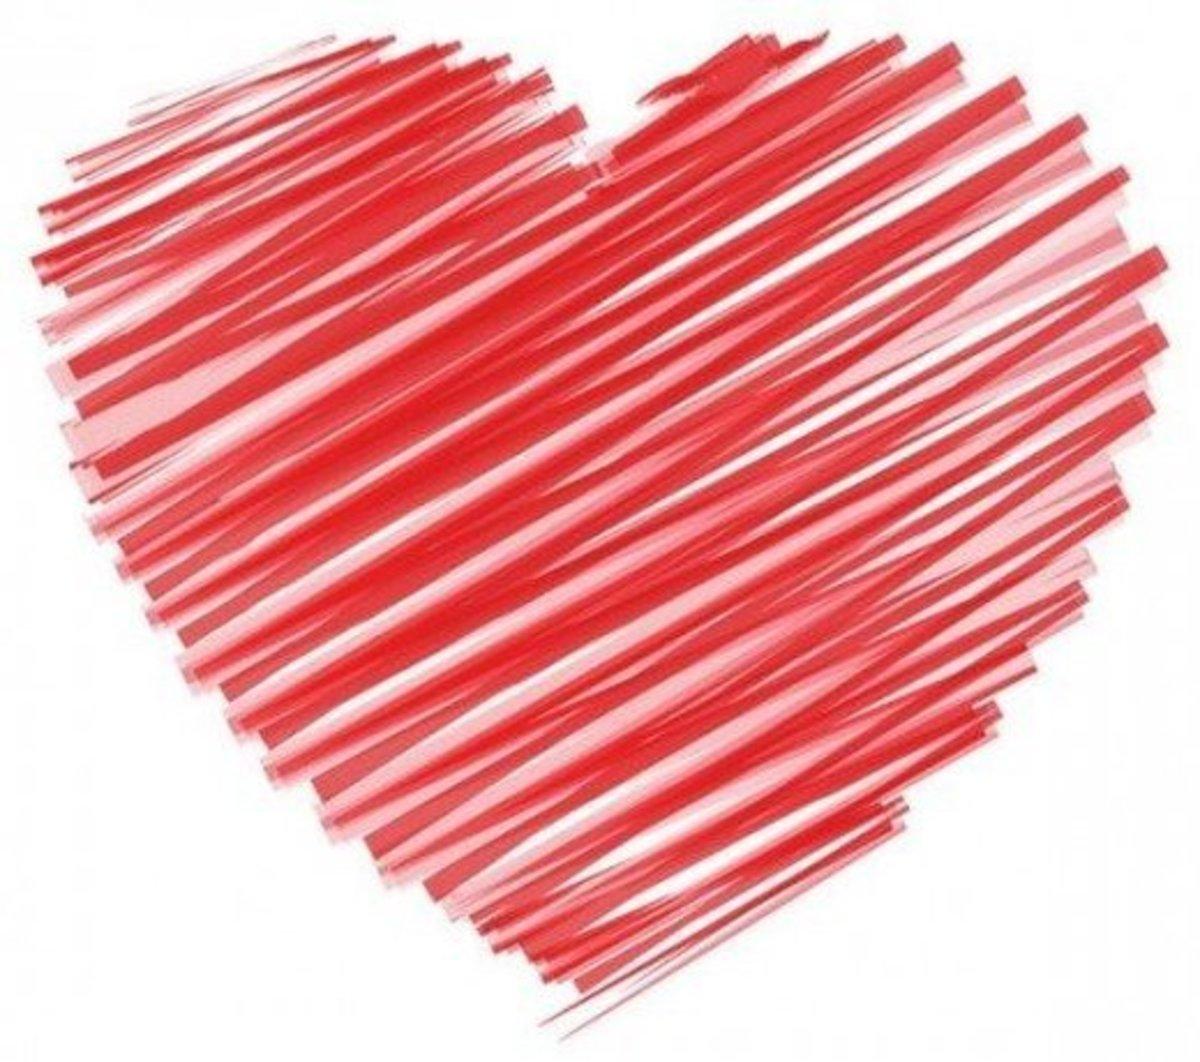 Heart Drawing Pattern